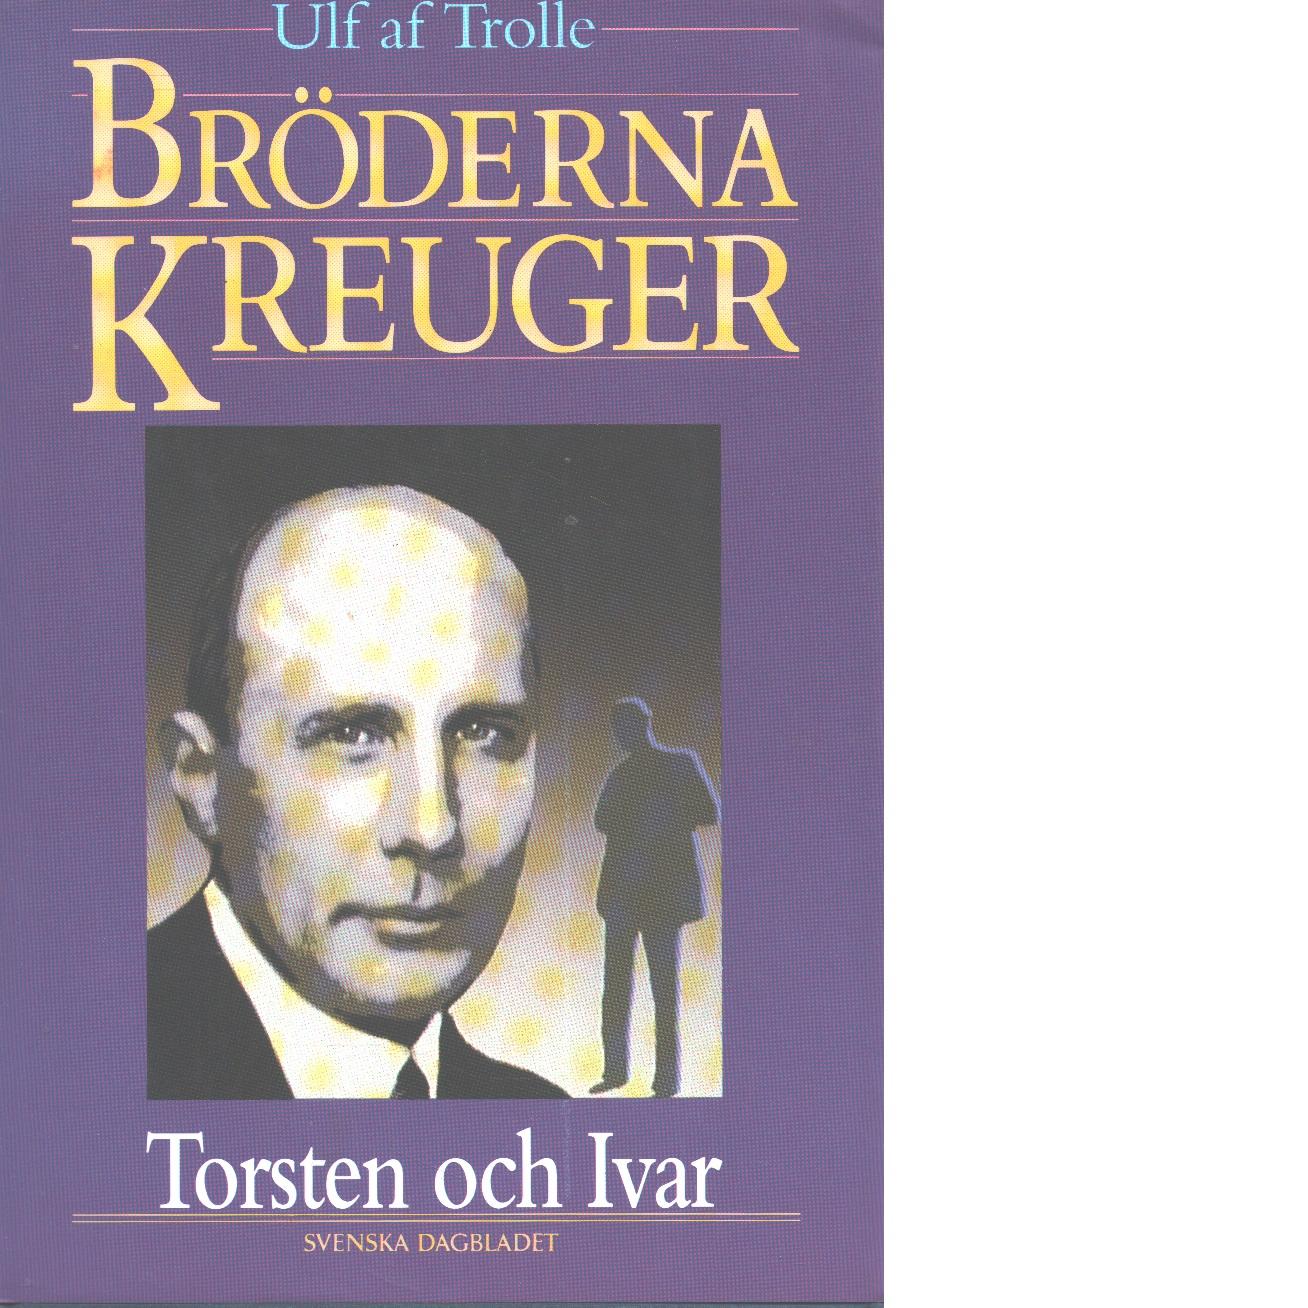 Bröderna Kreuger : Torsten och Ivar - Trolle, af Ulf